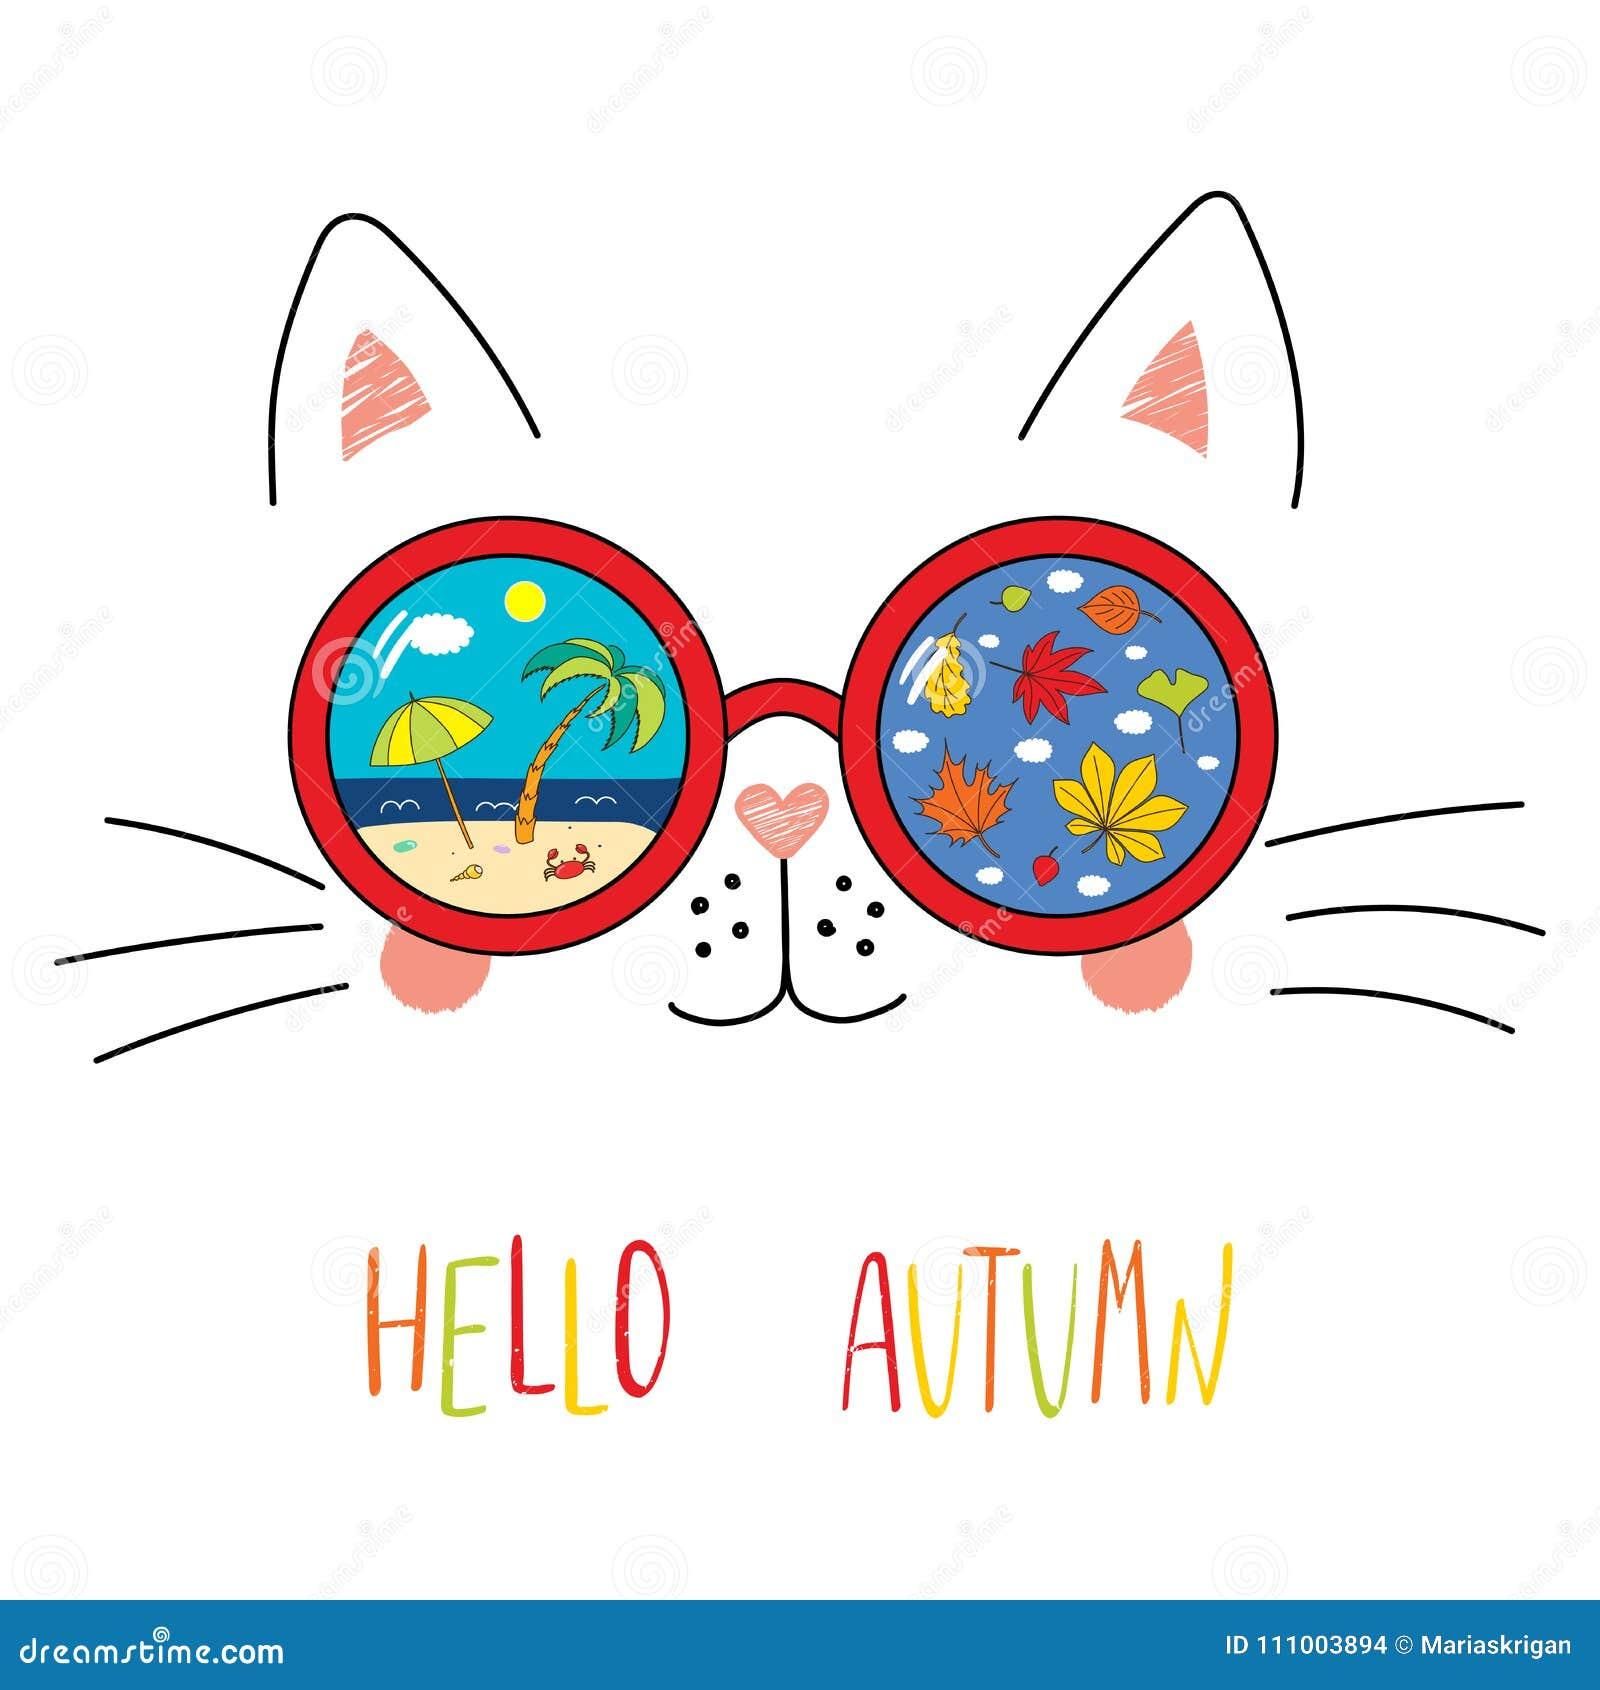 a58683c76f0 Hand drawn portrait of a cute cartoon funny cat in sunglasses with beach  scene